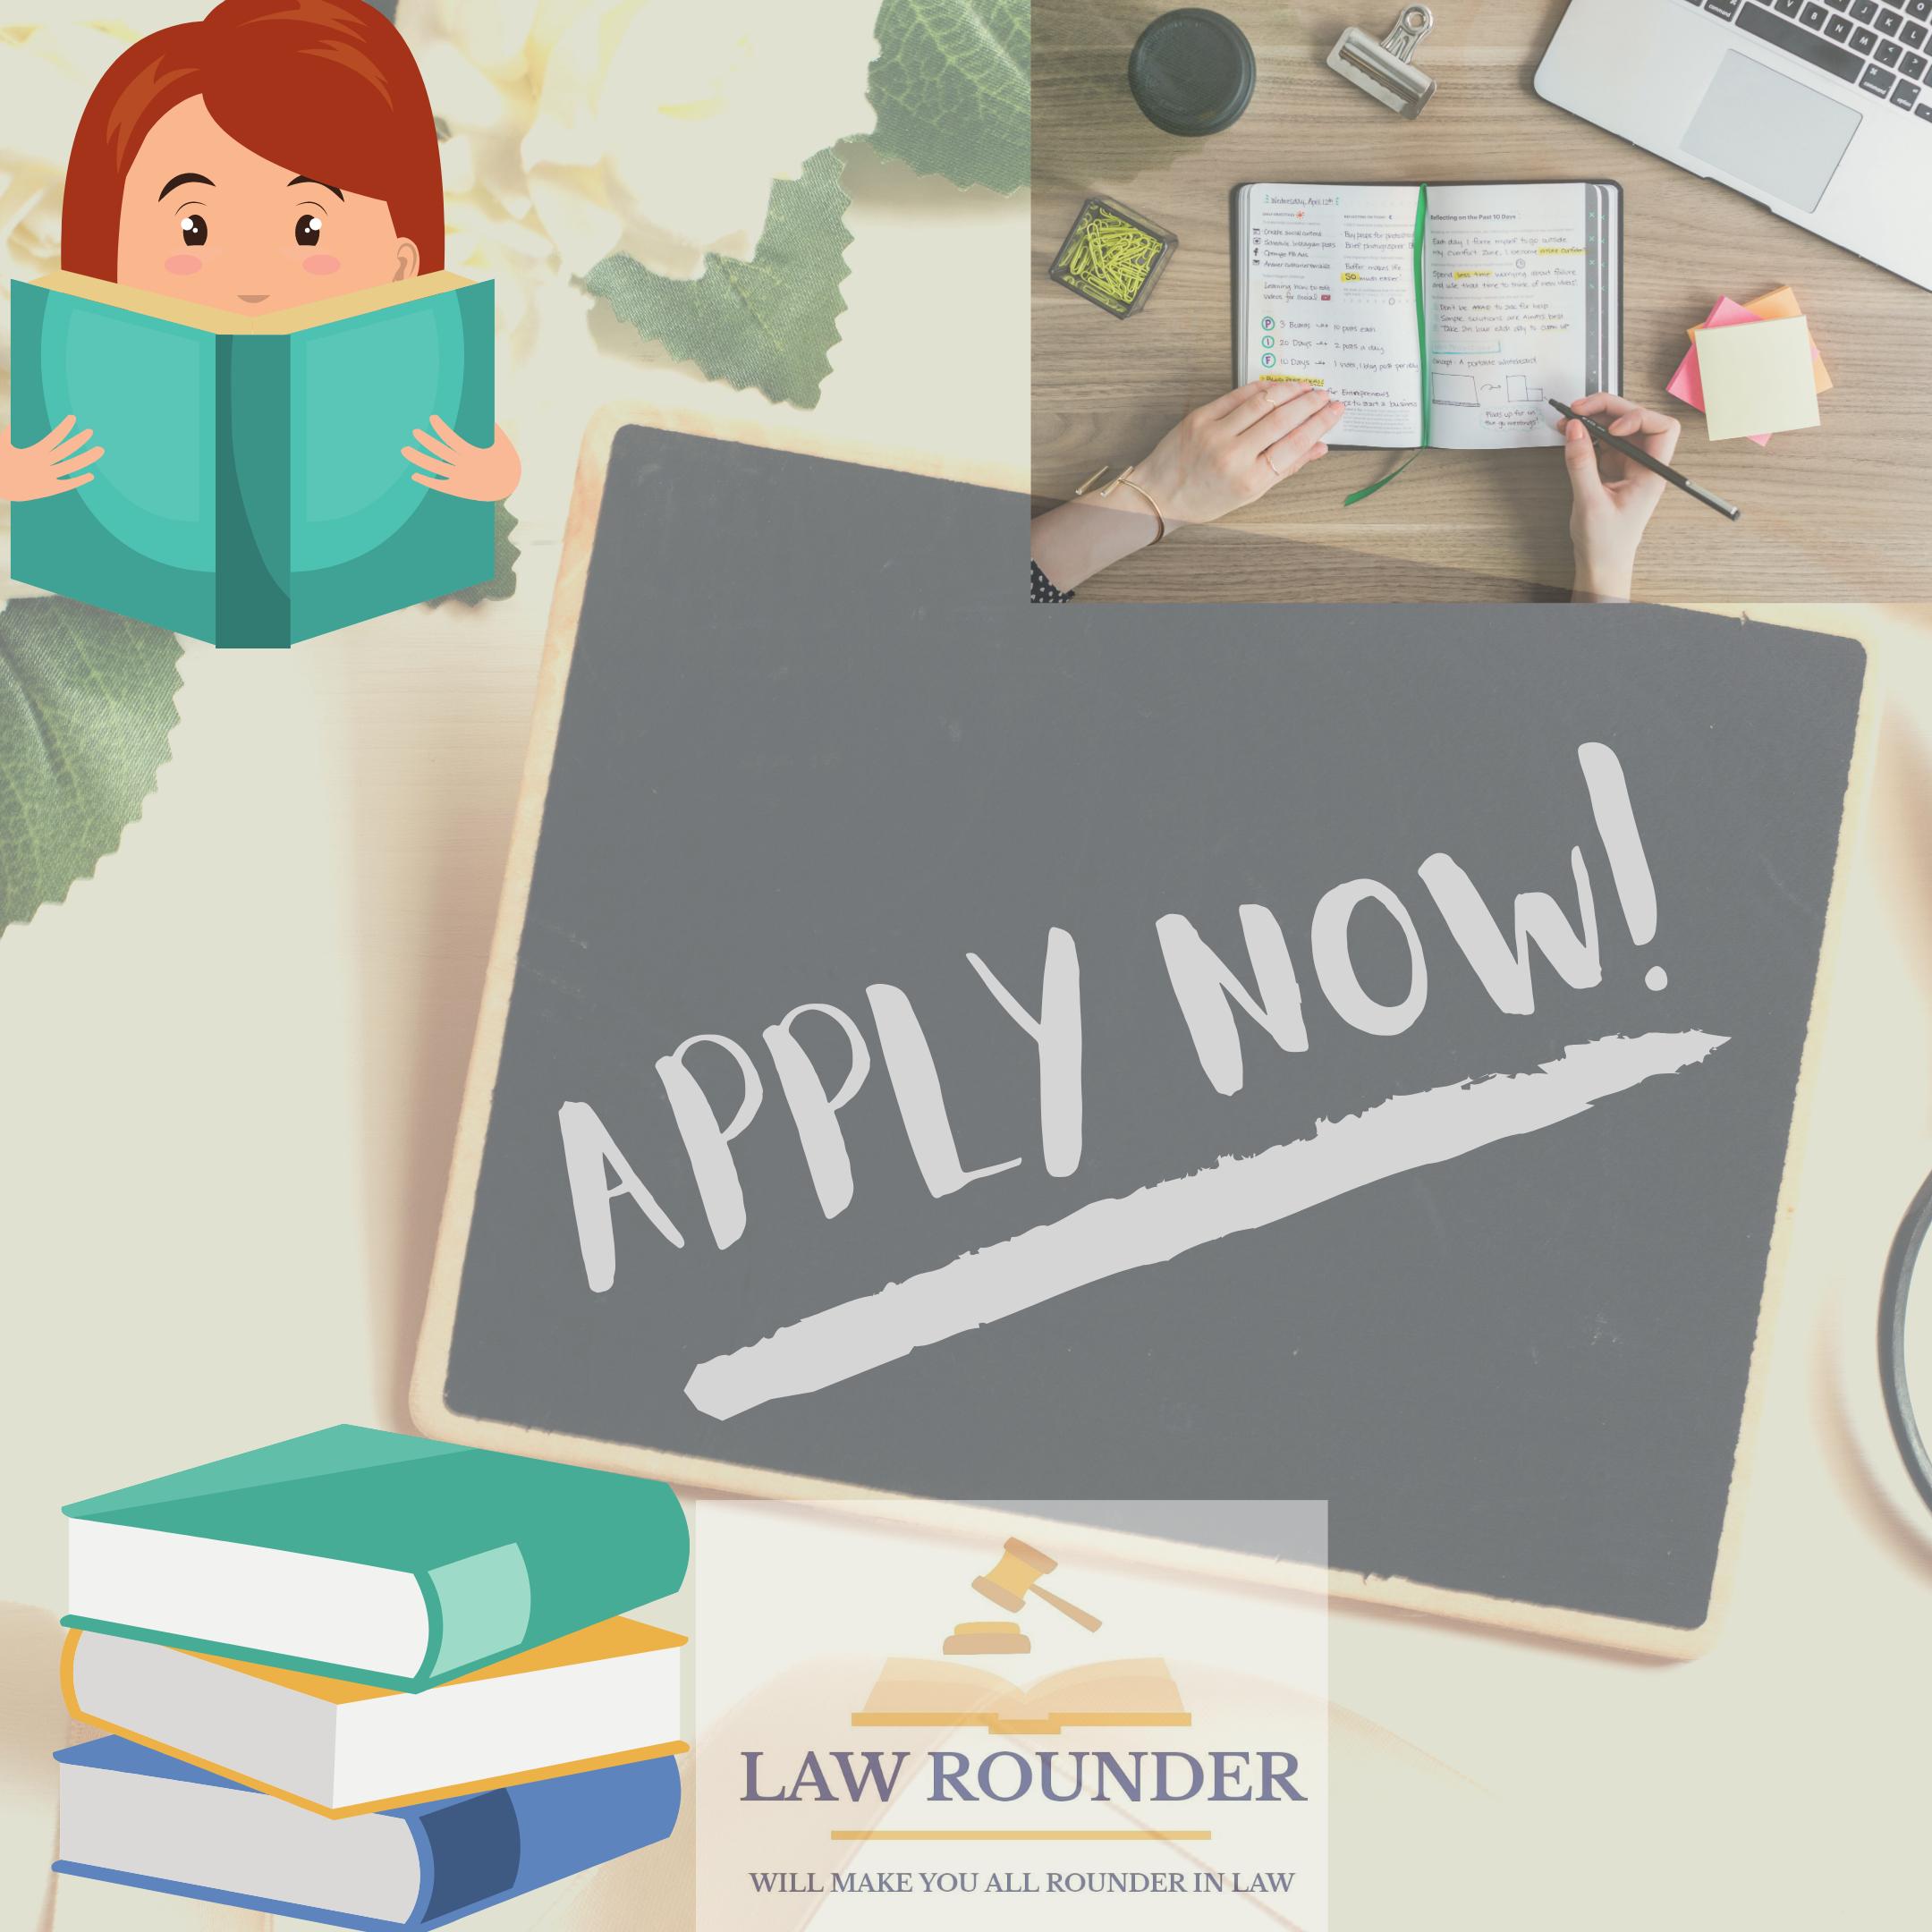 Online internship opportunities